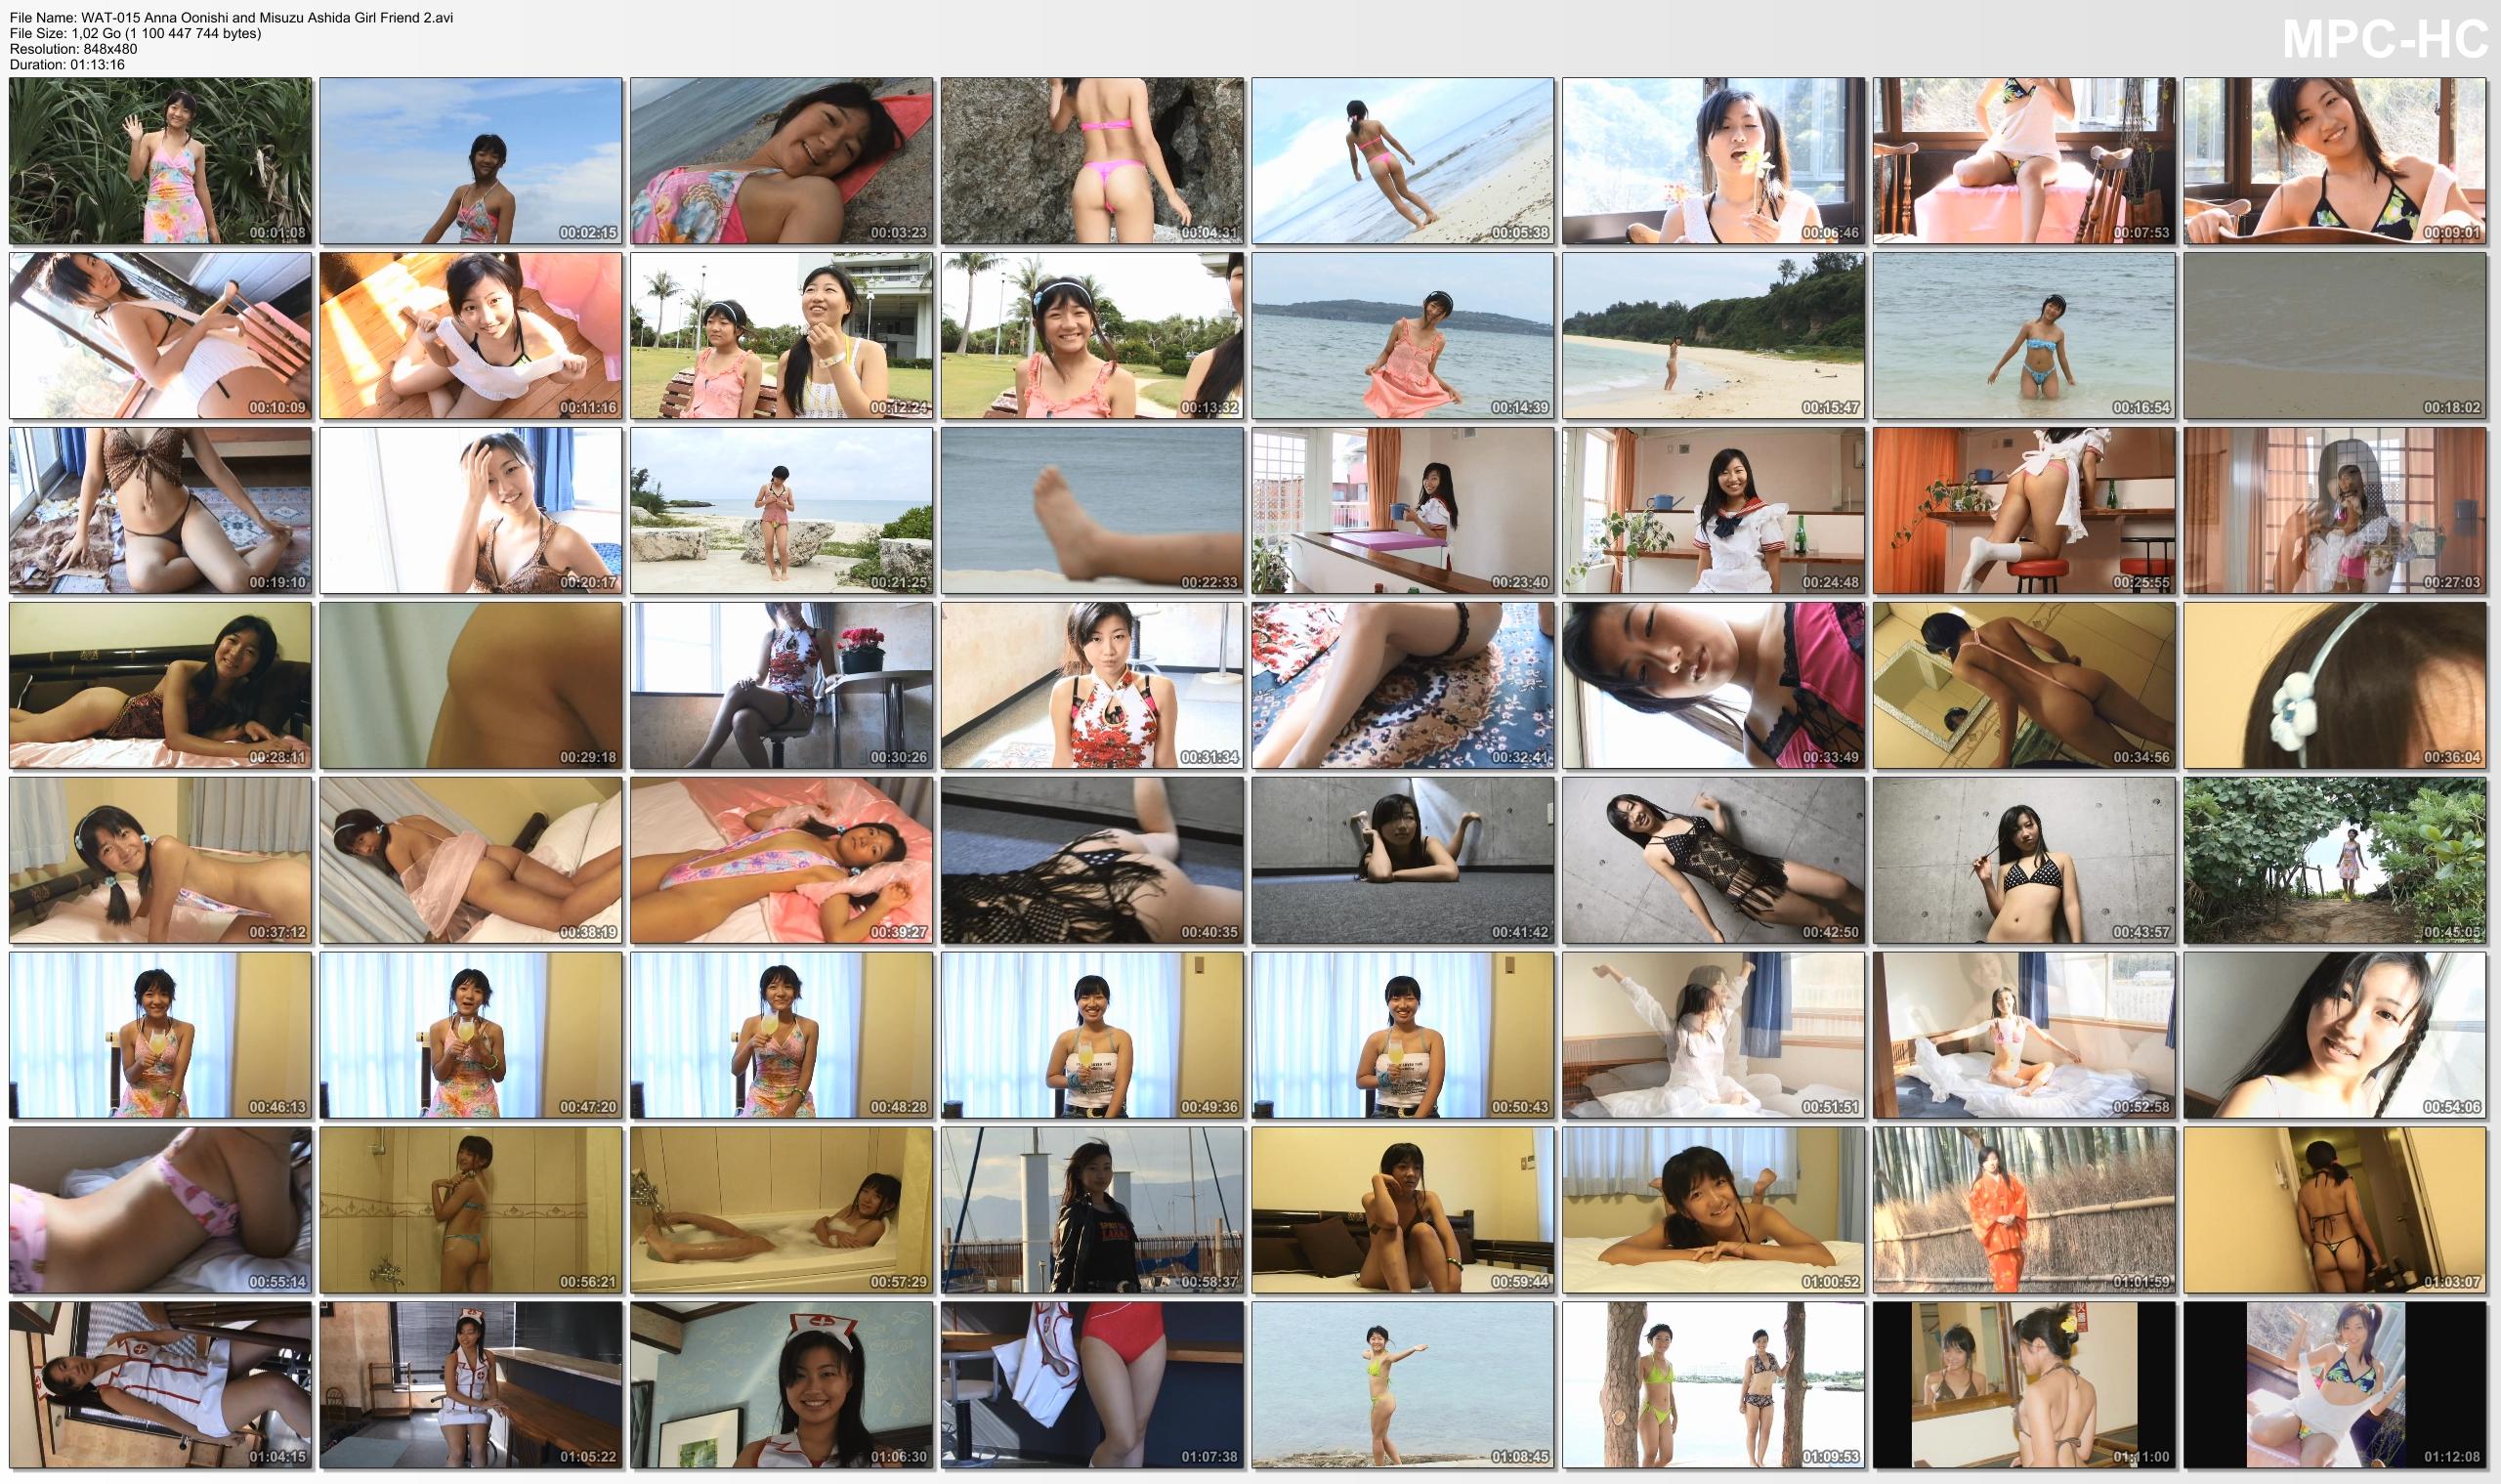 WAT-015 Anna Oonishi and Misuzu Ashida Girl Friend 2 screenshot.